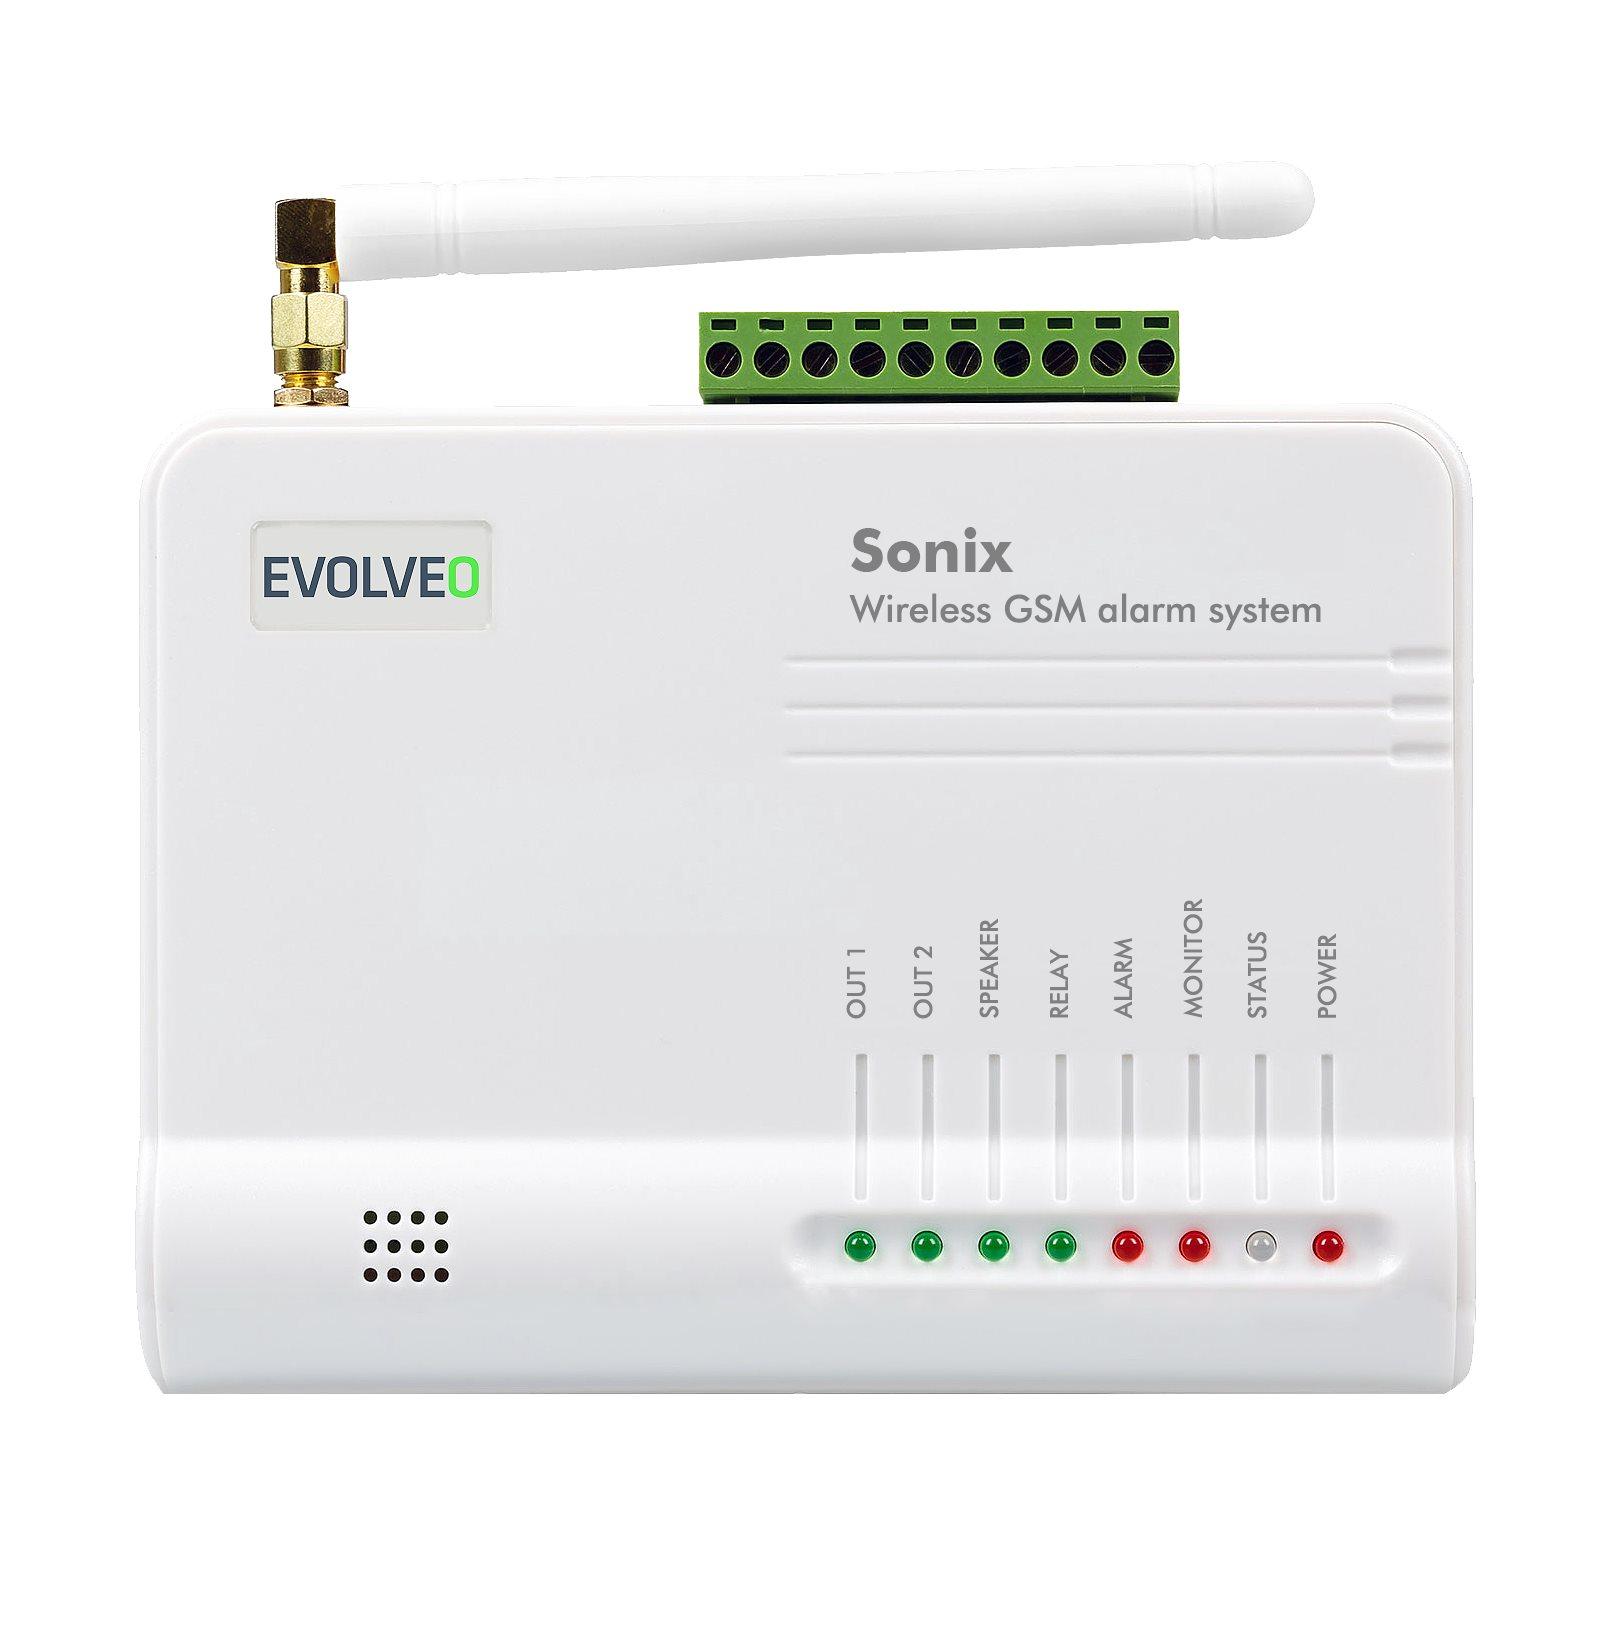 EVOLVEO Sonix - bezdrátový GSM alarm